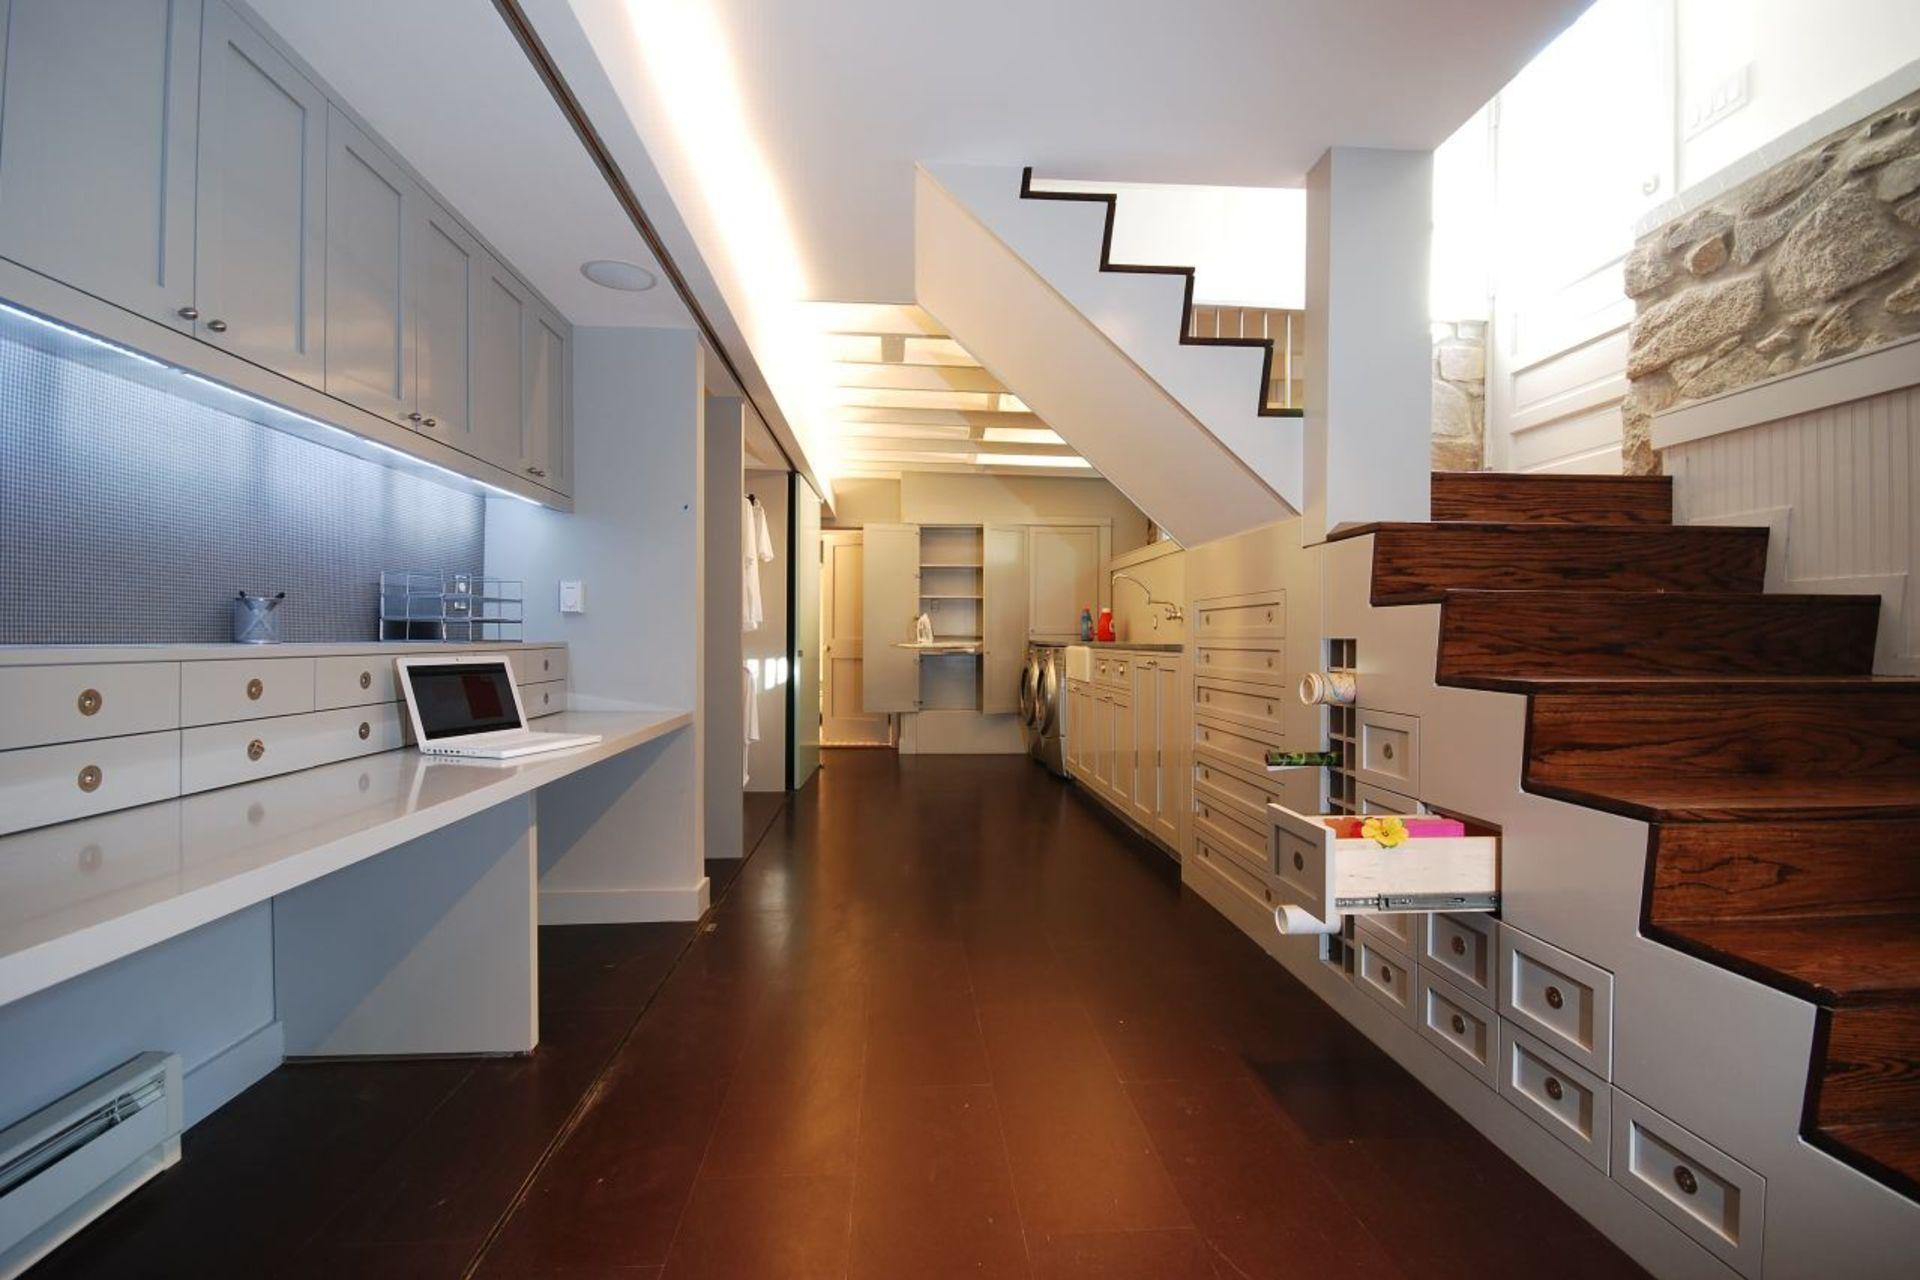 Basement & Attic Storage Ideas to Gain More Space